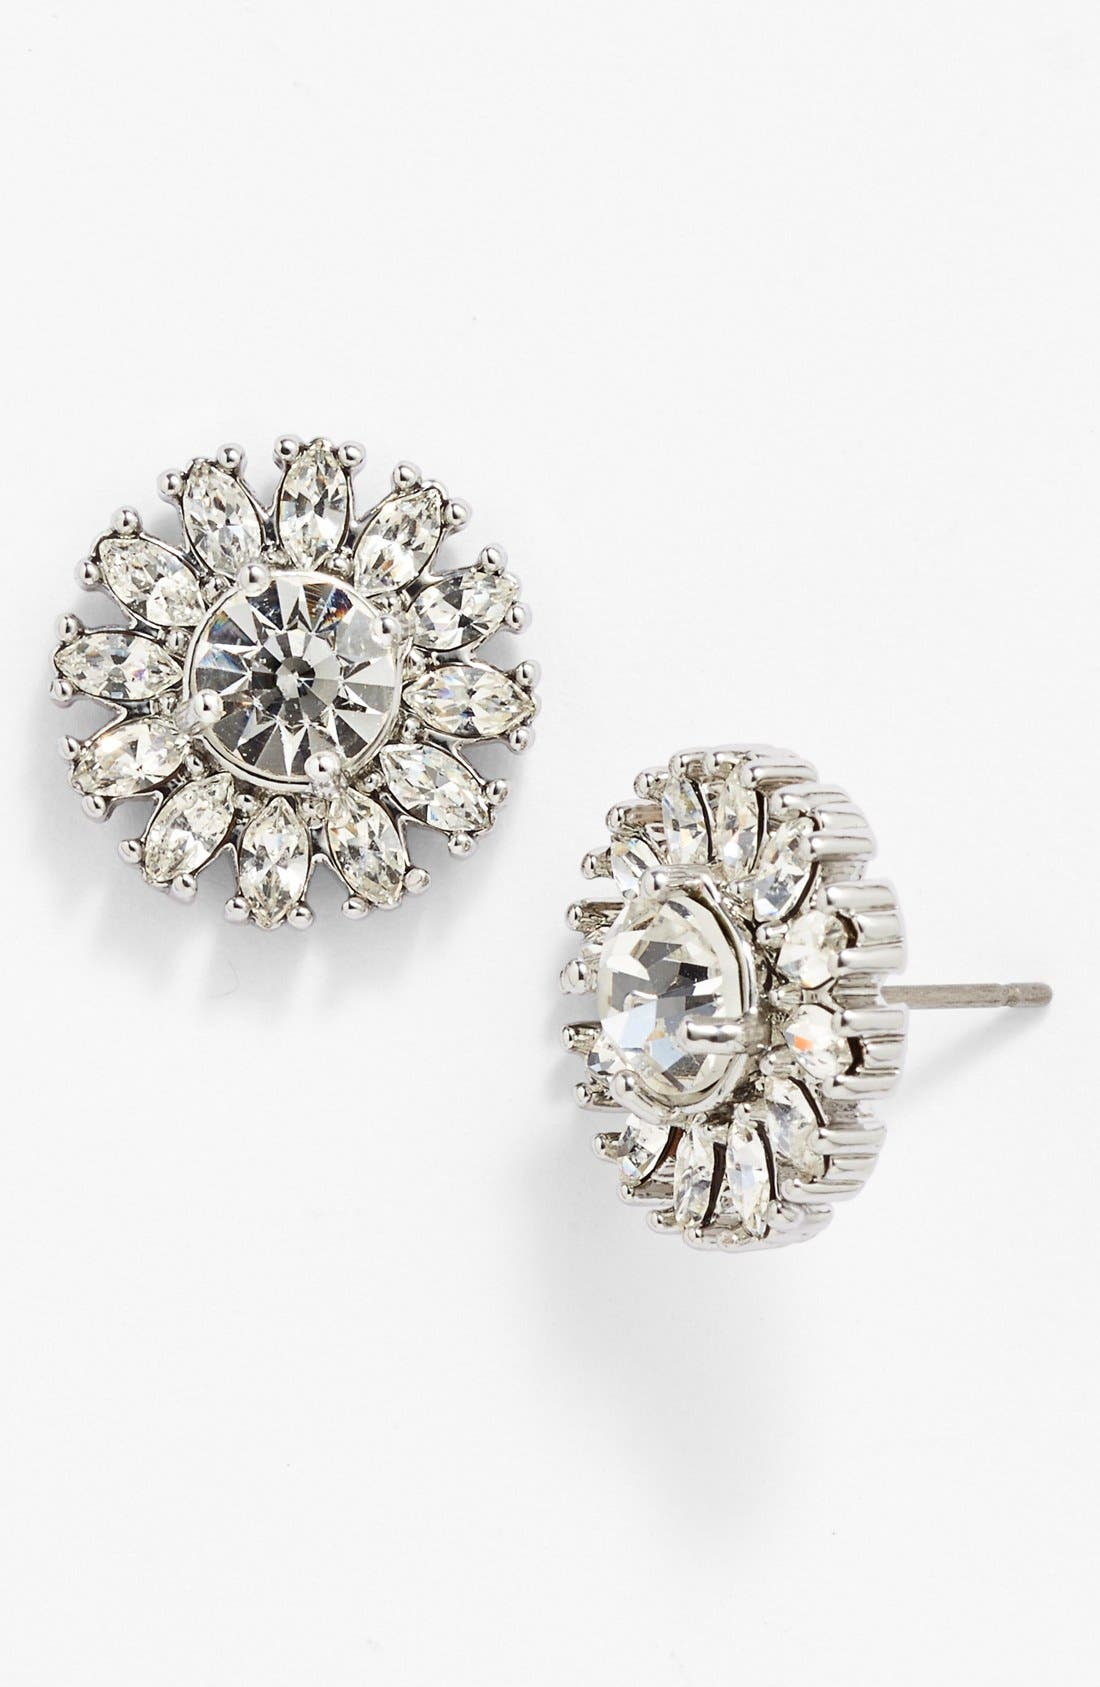 Alternate Image 1 Selected - kate spade new york 'estate garden' crystal stud earrings